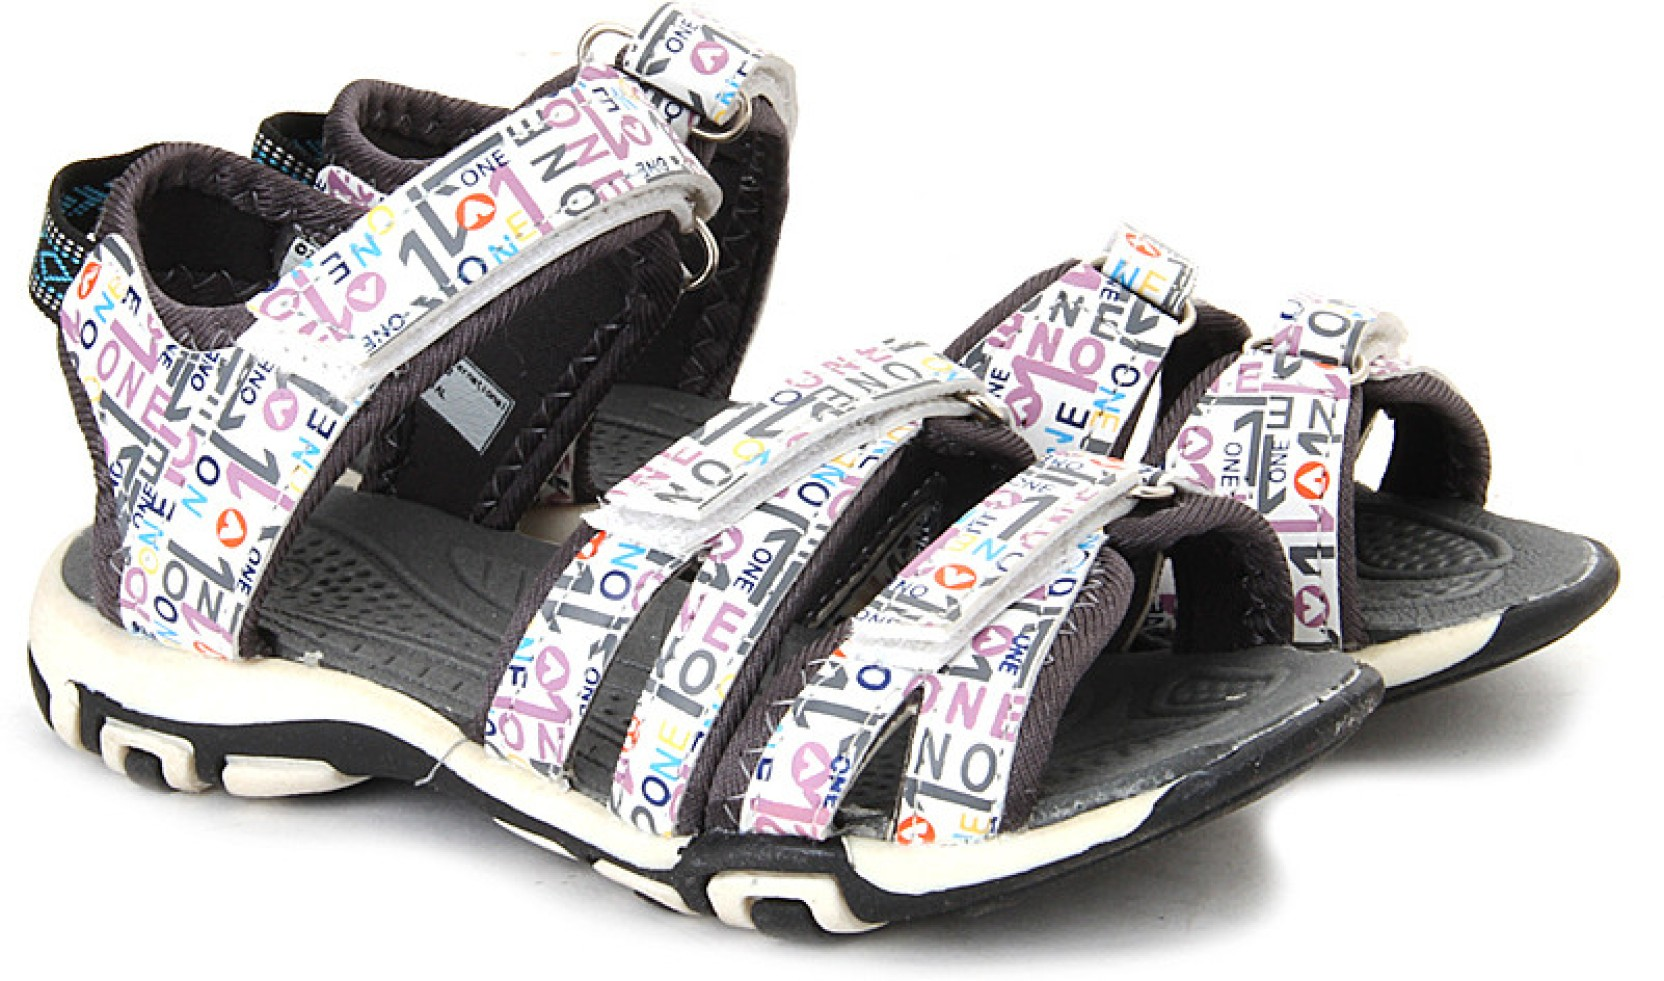 655725c079f2b Airwalk Boys   Girls Sports Sandals Price in India - Buy Airwalk Boys ...